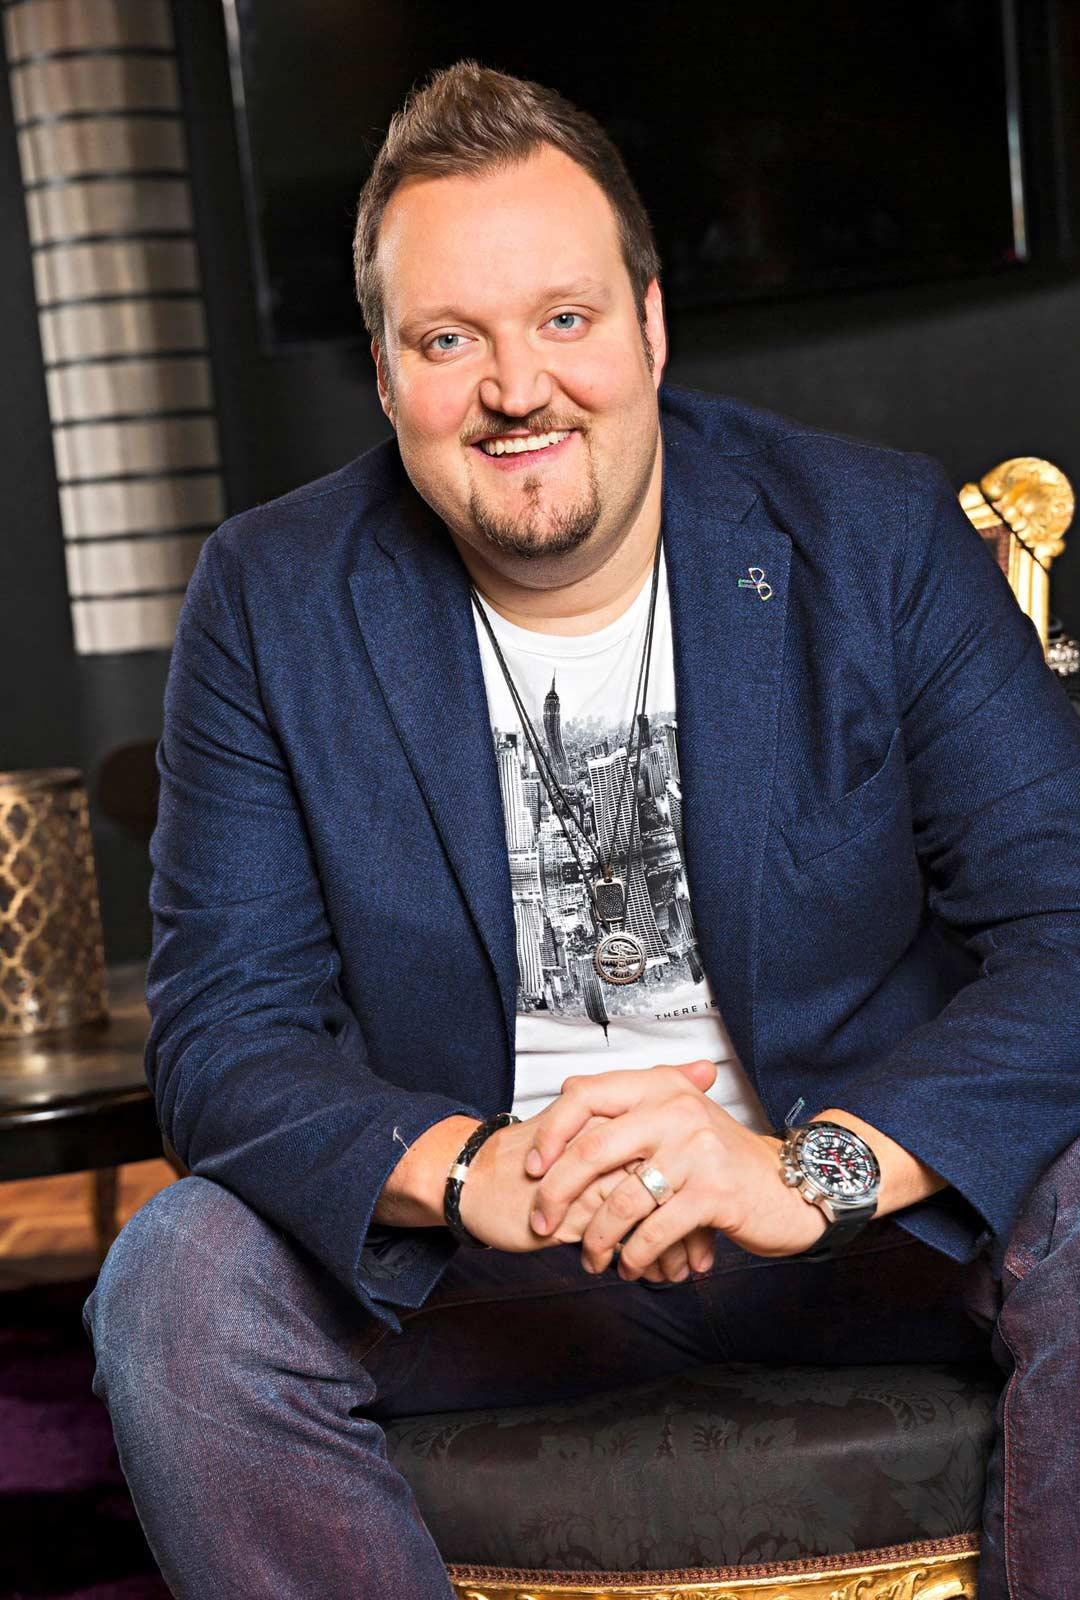 Stand up-koomikko Sami Hedberg